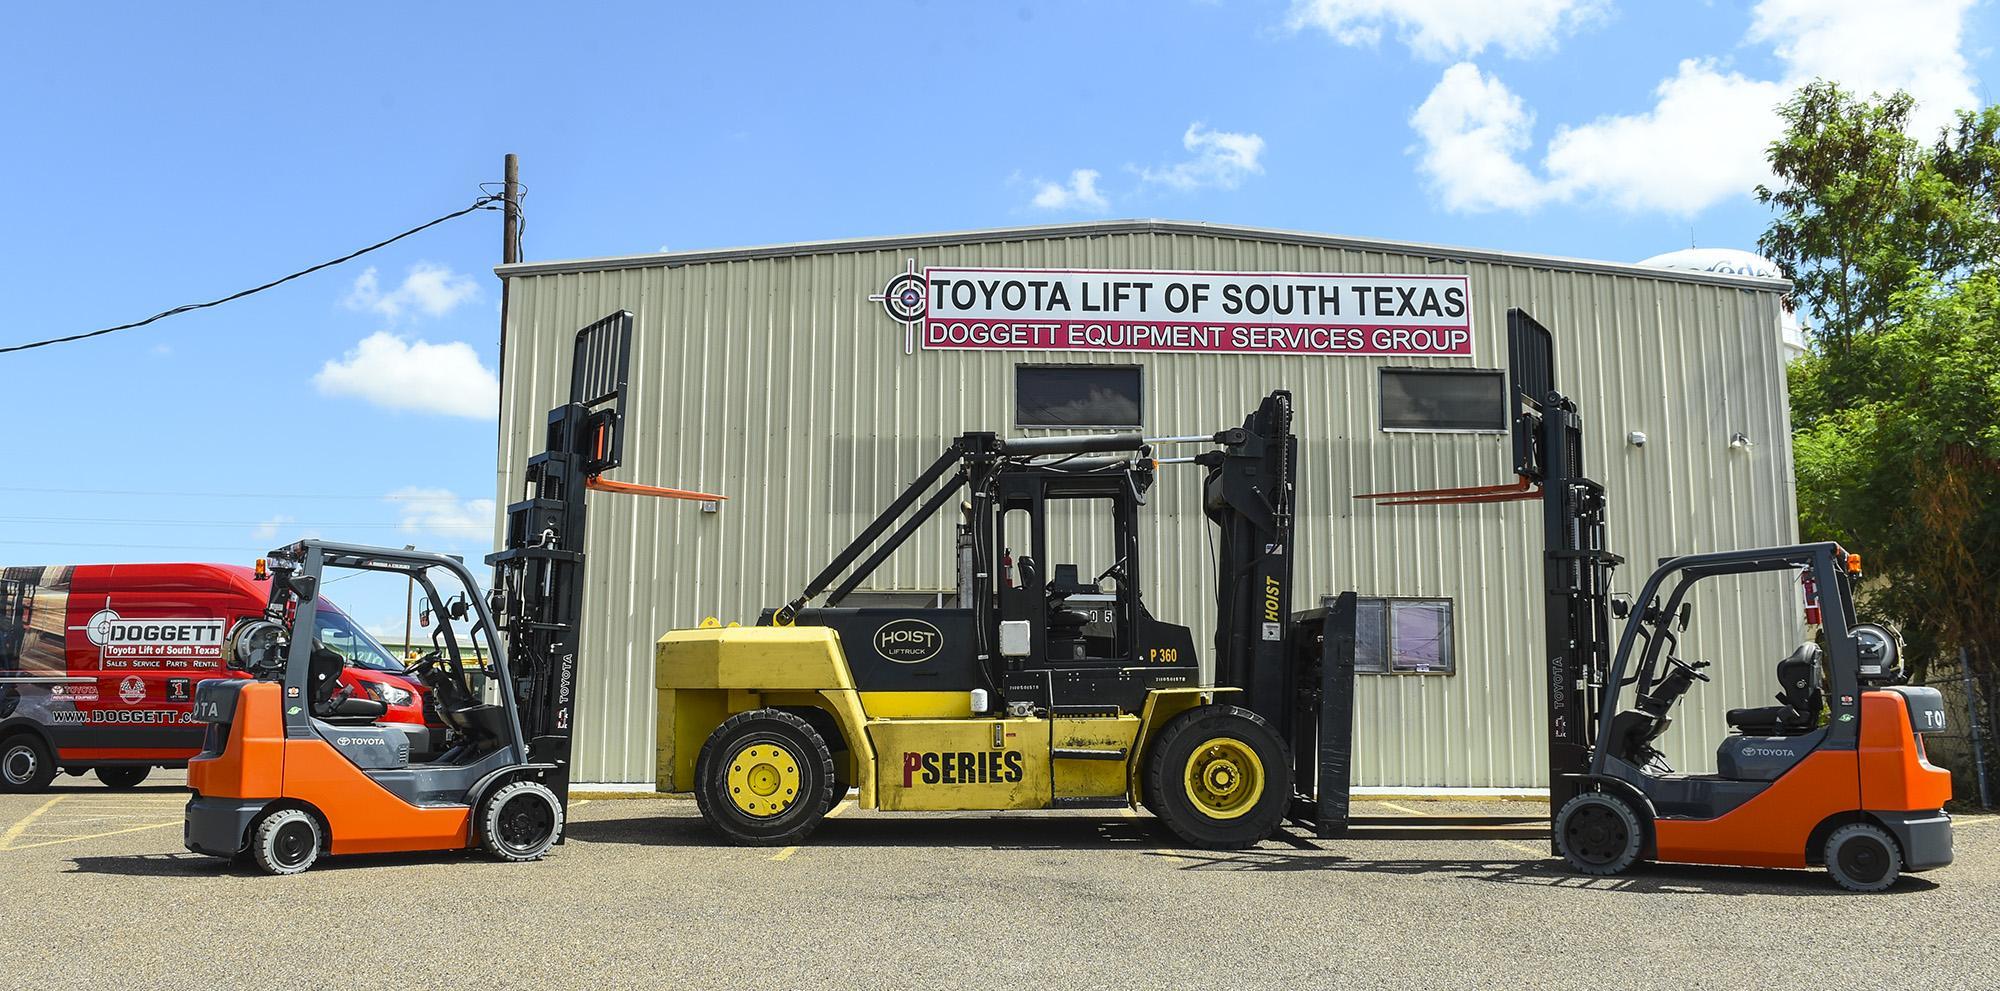 Toyota Lift Of South Texas Laredo Morning Times Installation